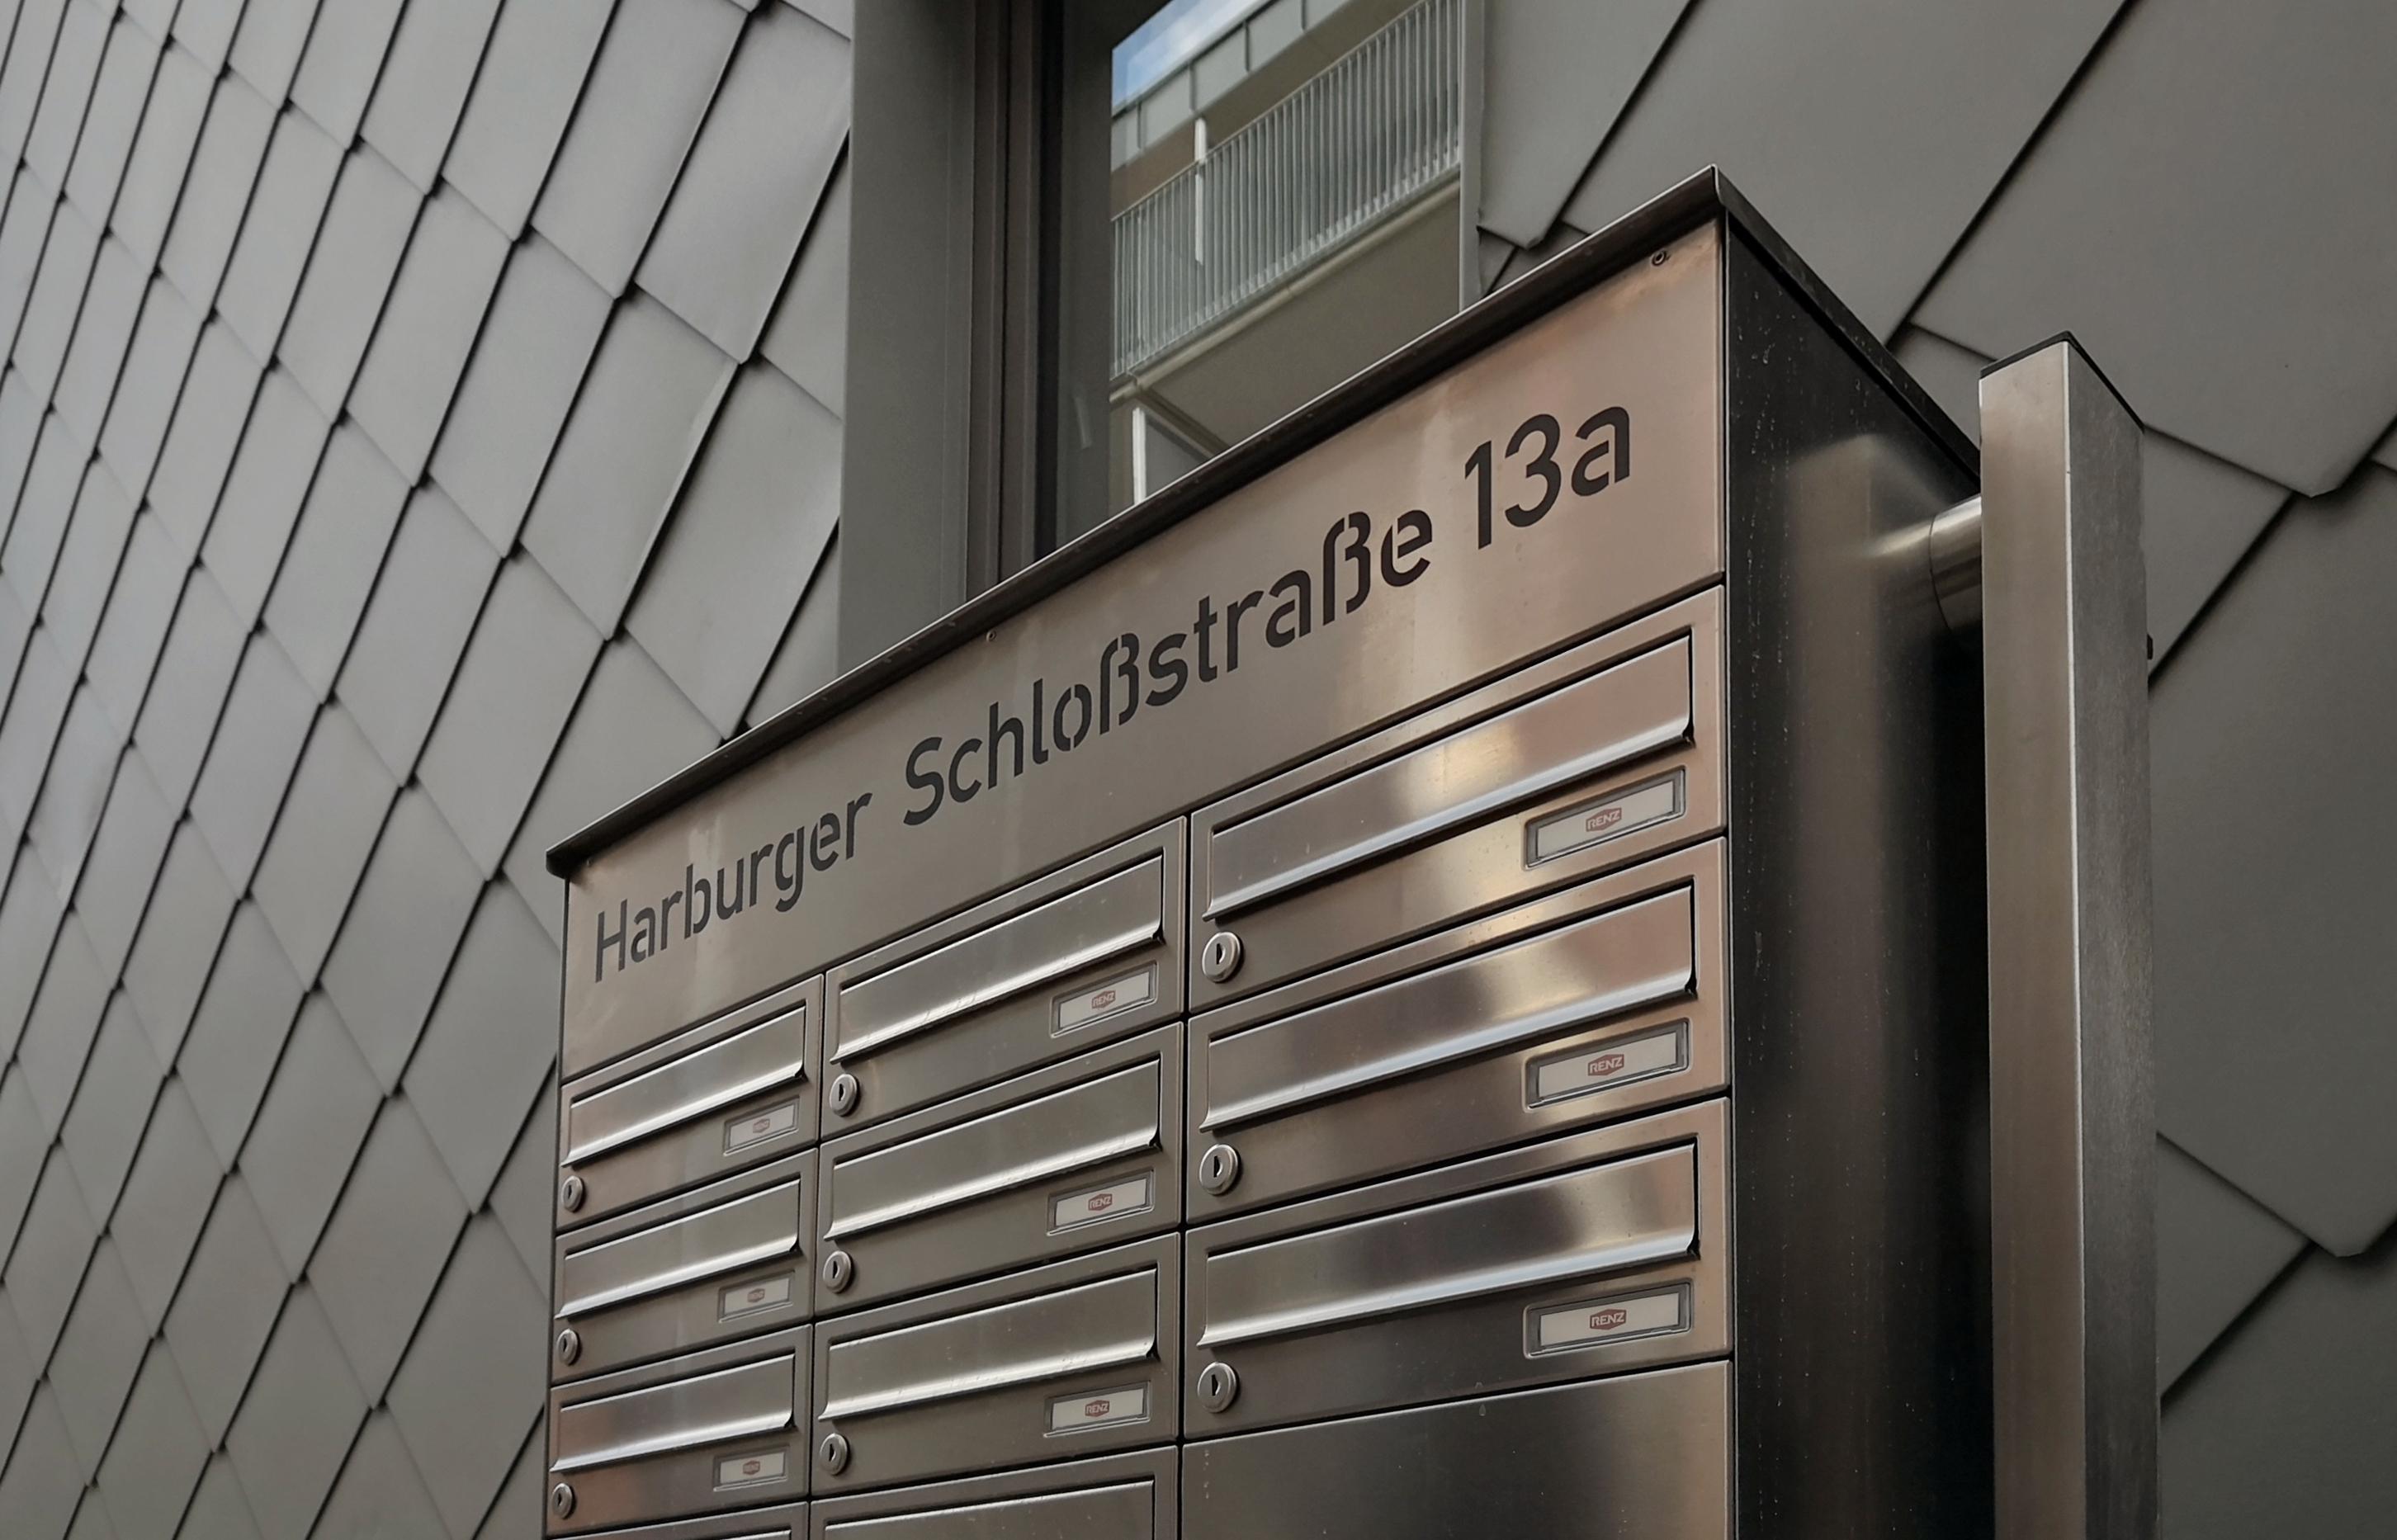 Harburger Schloßstraße 13 a